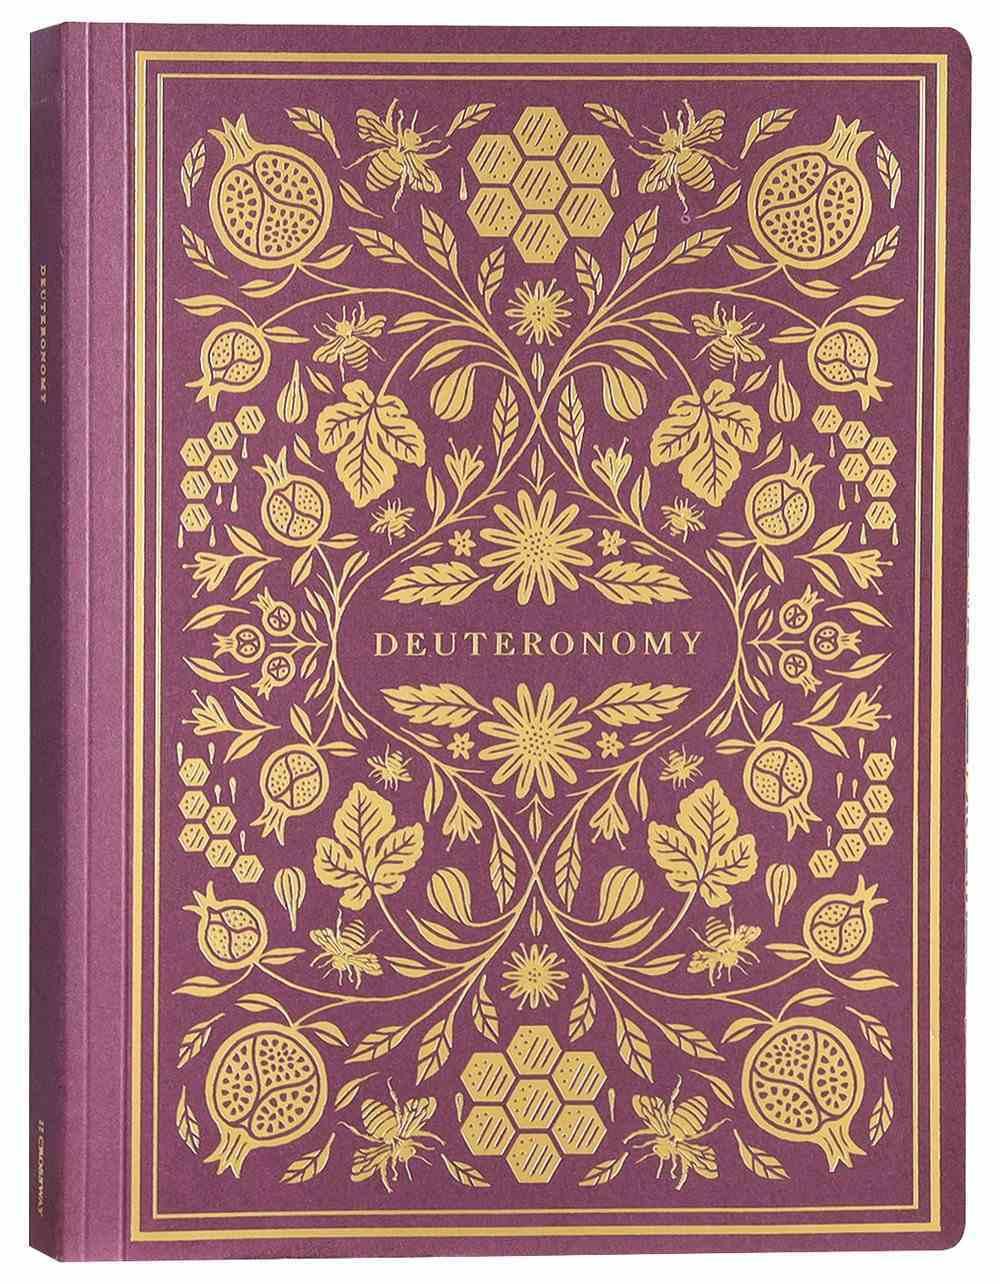 ESV Illuminated Scripture Journal Deuteronomy (Black Letter Edition) Paperback